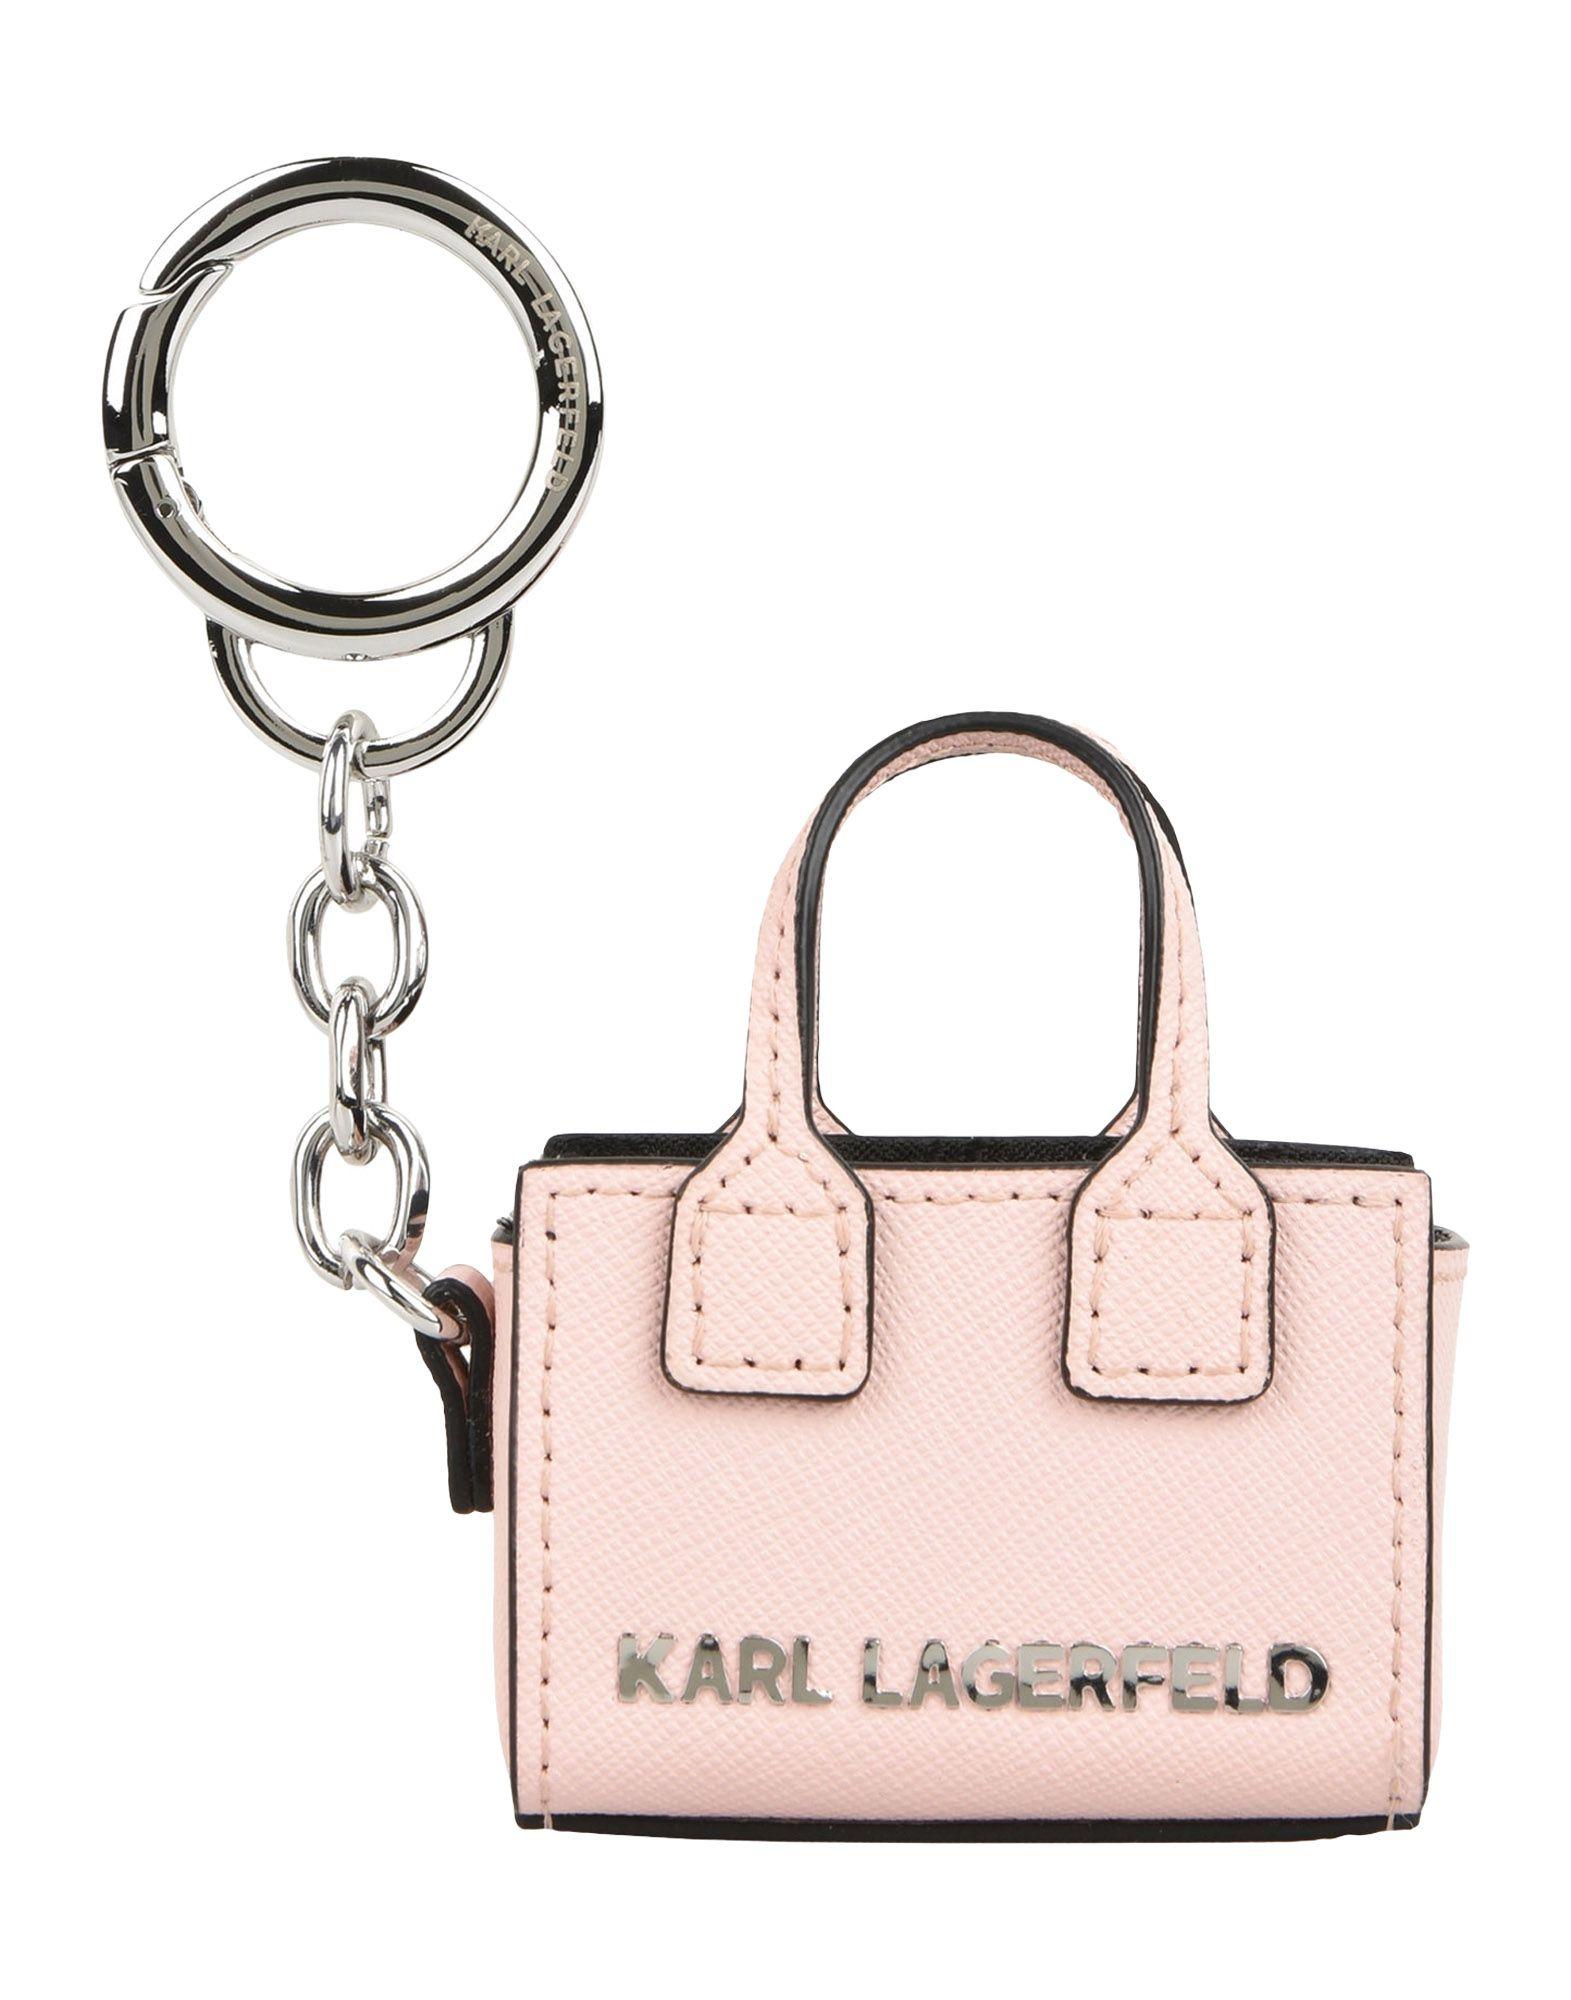 KARL LAGERFELD Брелок для ключей чехлы для телефонов karl lagerfeld lagerfeld iphone 5s se monster choupette hard tpu beige